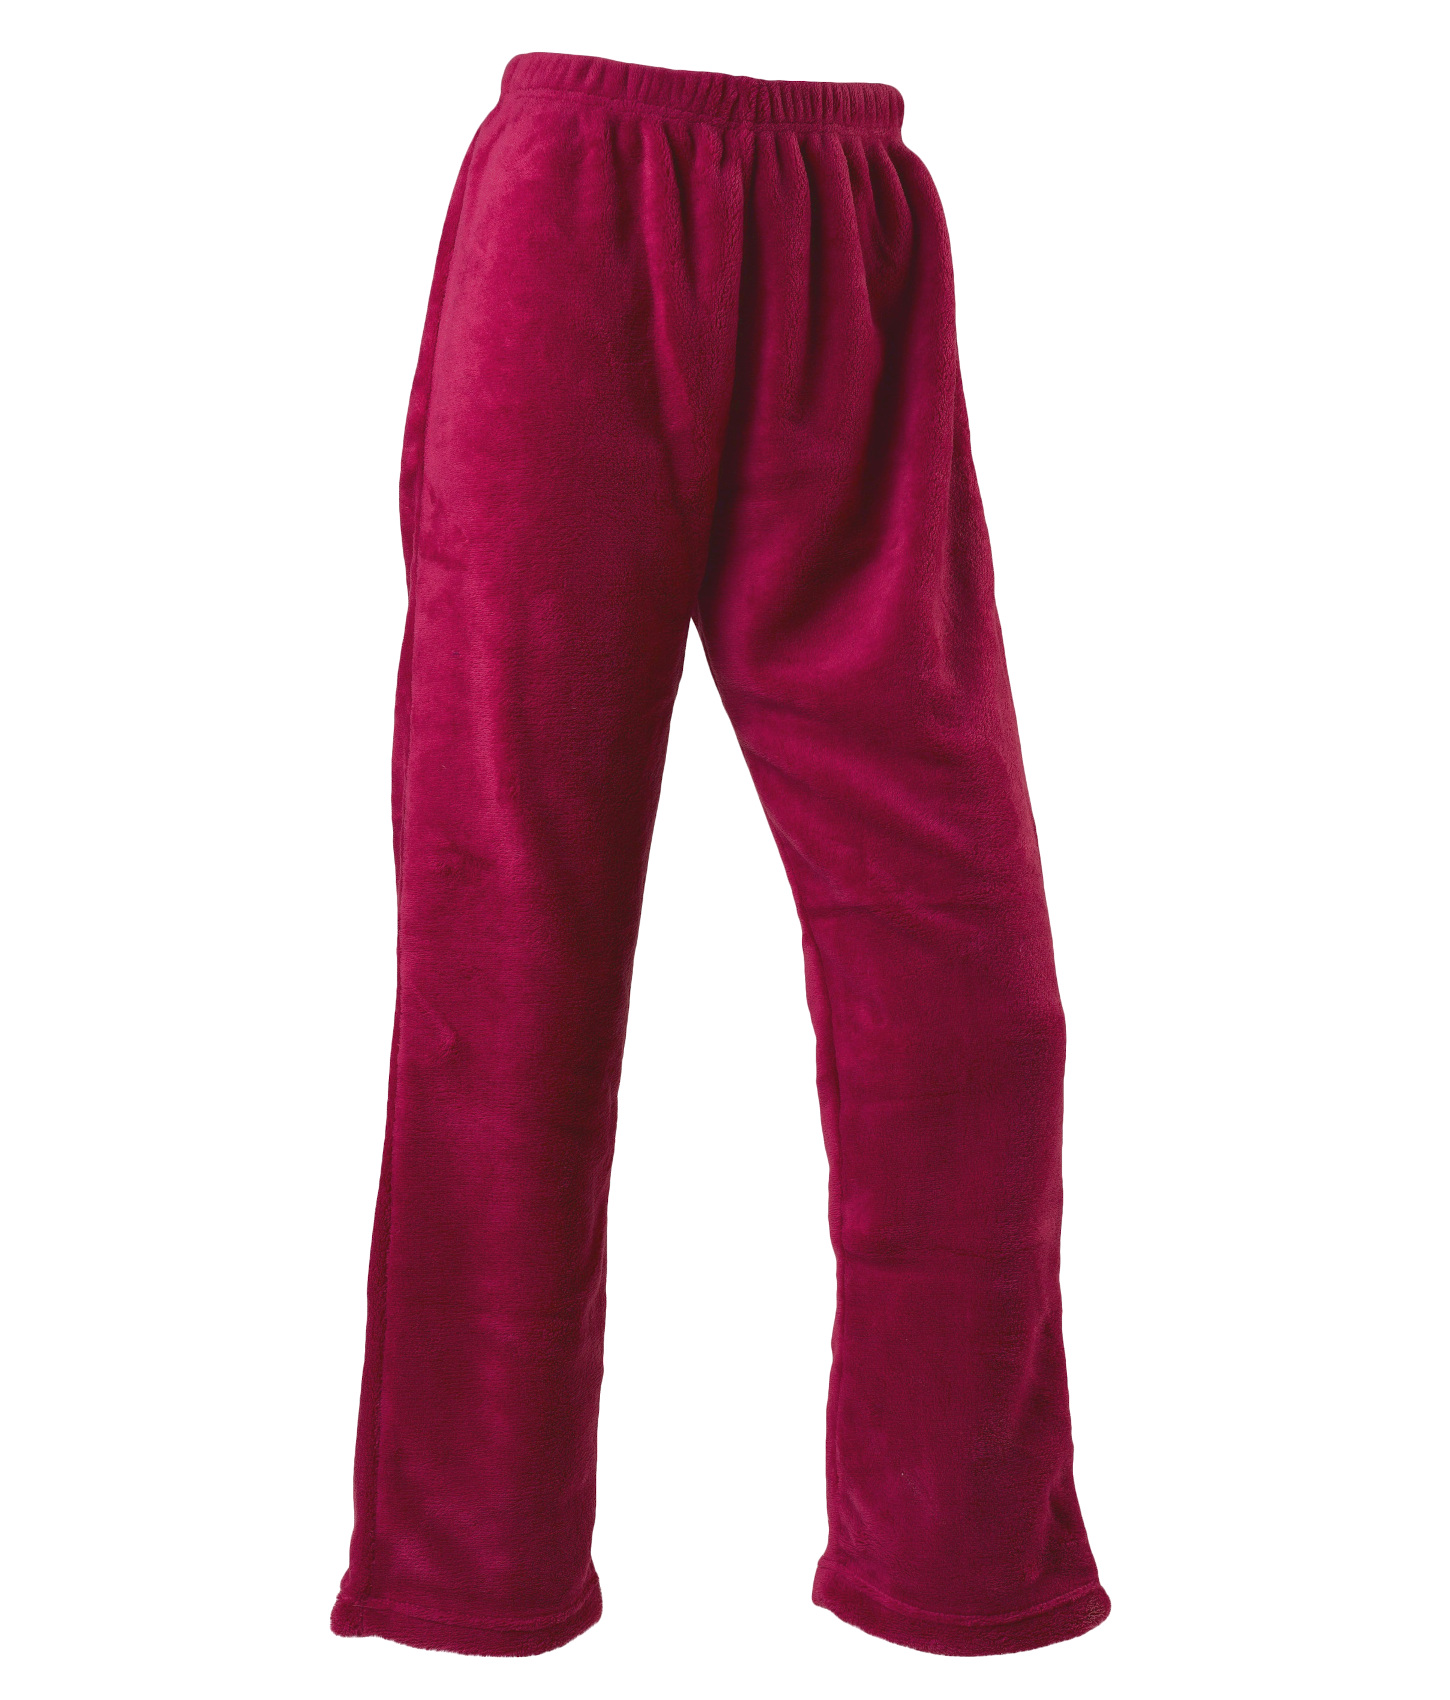 Lounge Pants Womens Soft Thick Coral Fleece Plain PJ Trouser Bottoms Slenderella